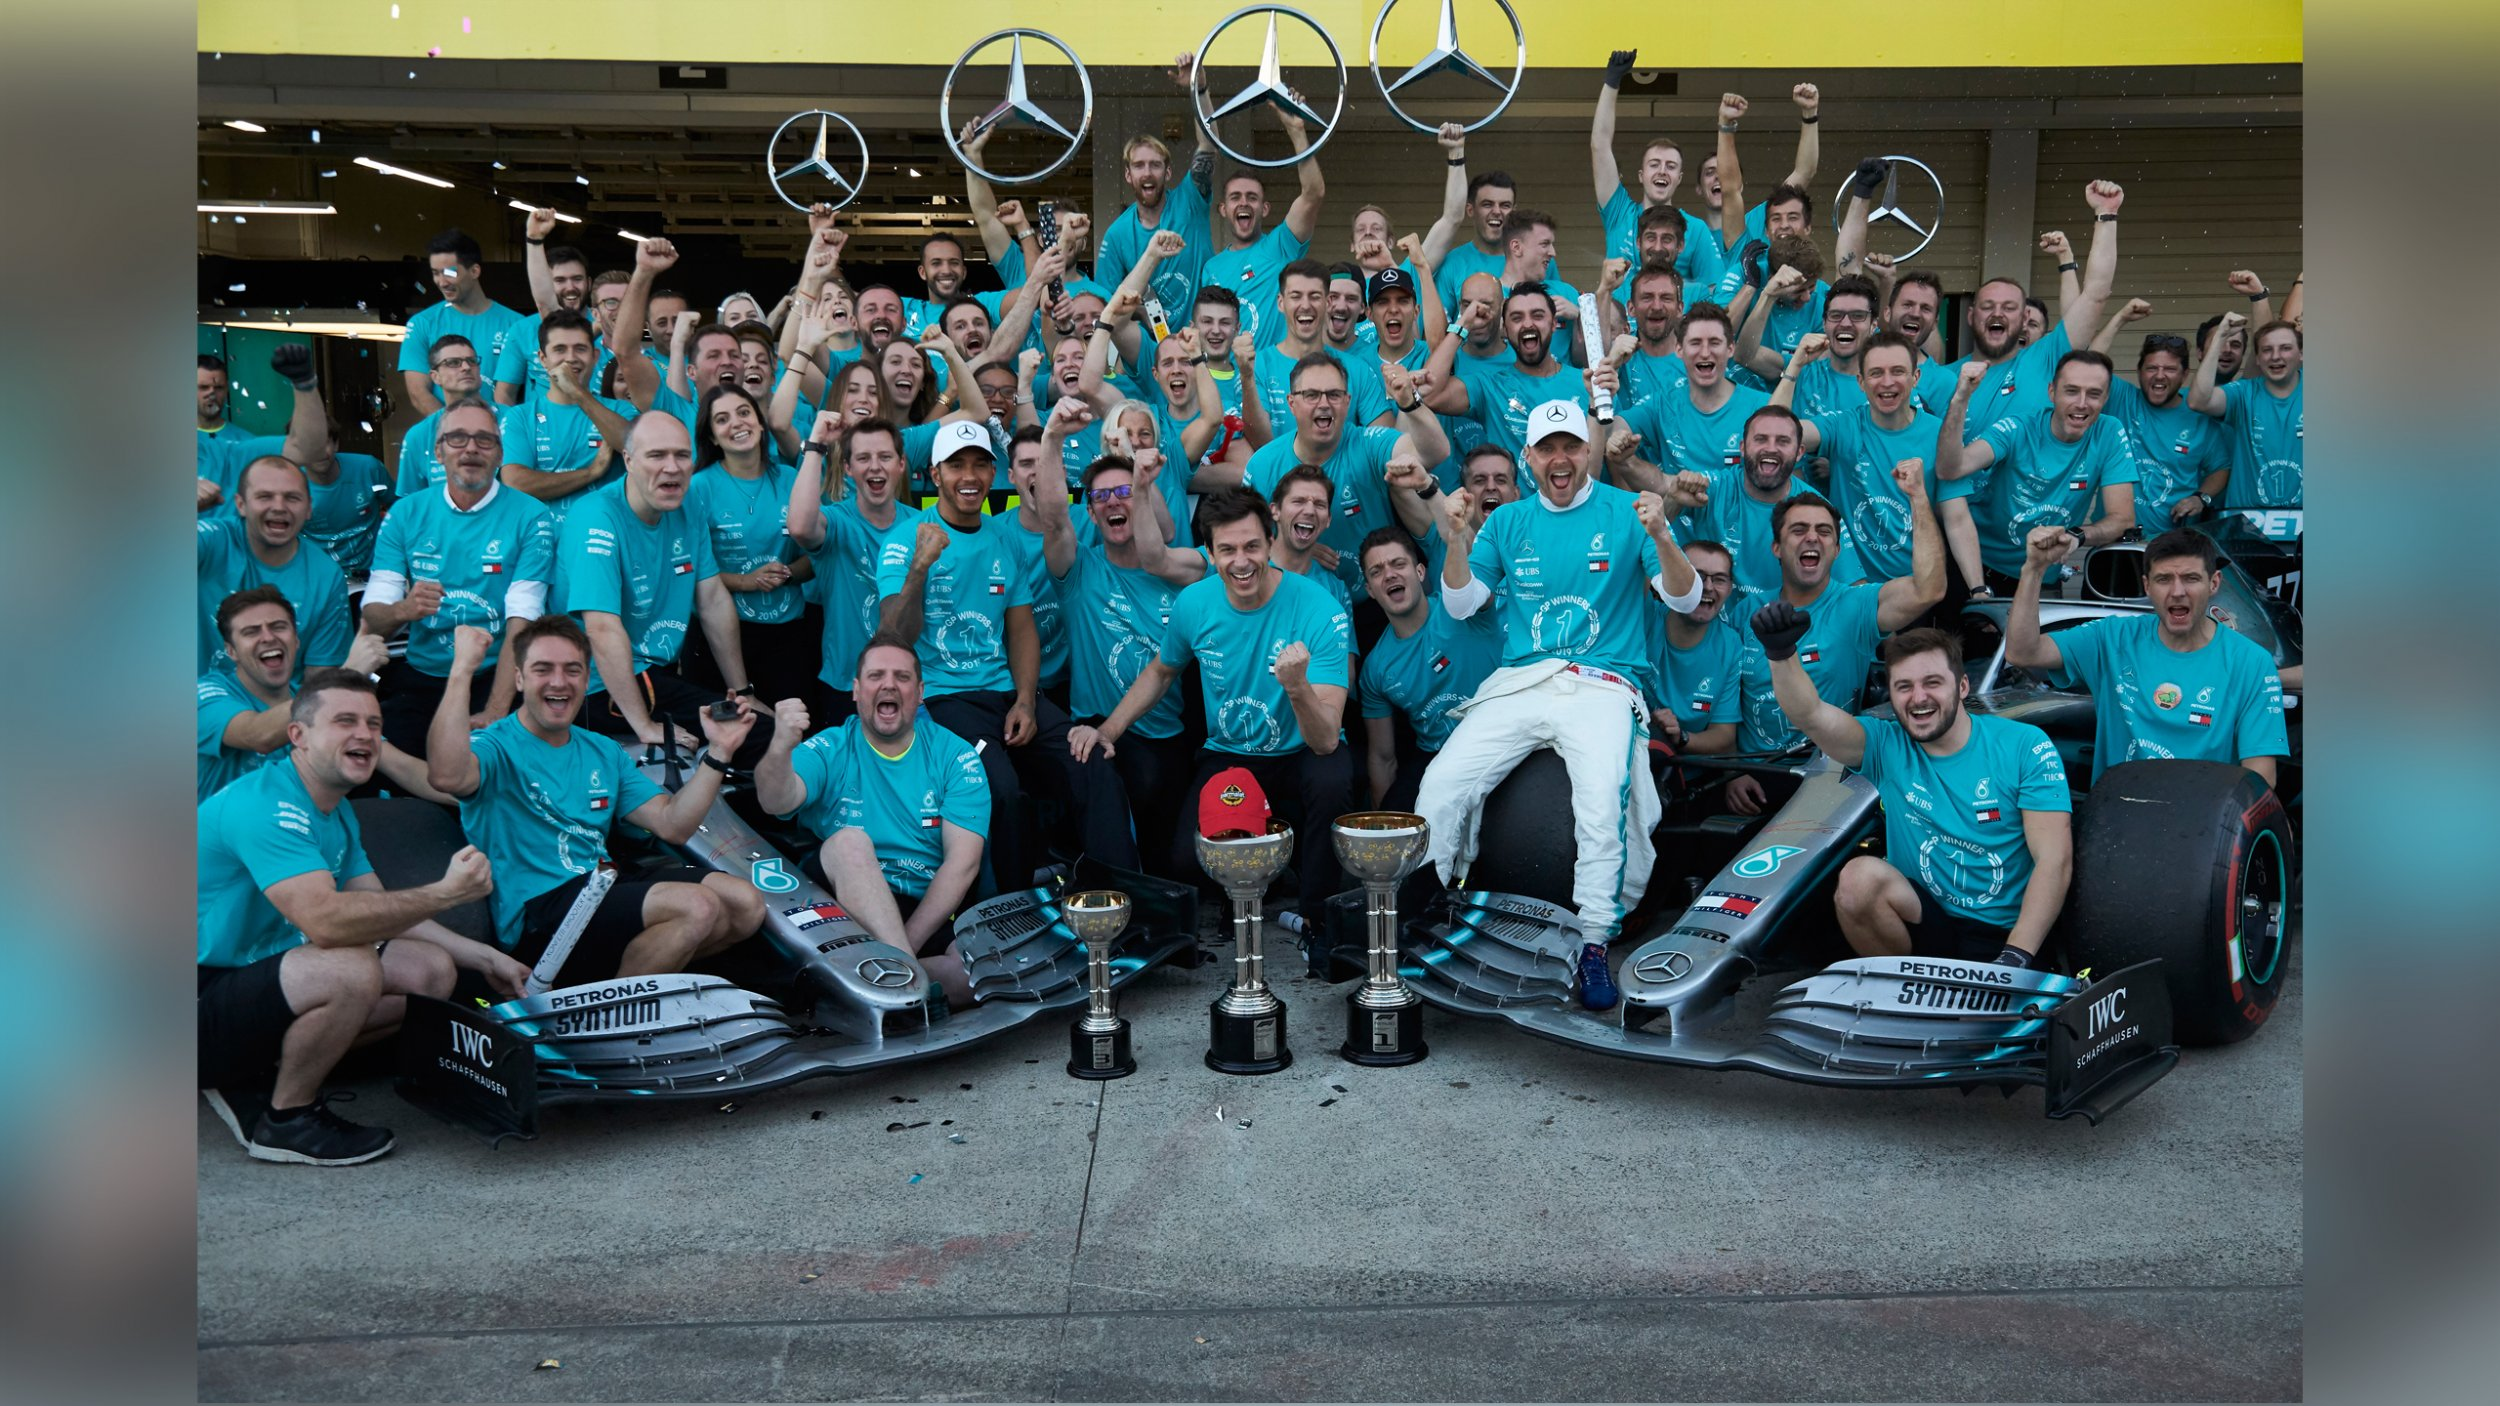 https://cloud.mb-lounge.com/files/HQ-Events/Motorsport/Formel%201/event-calendar-mercedes-benz-formula-1-grand-prix-japan-2560x1440.jpg